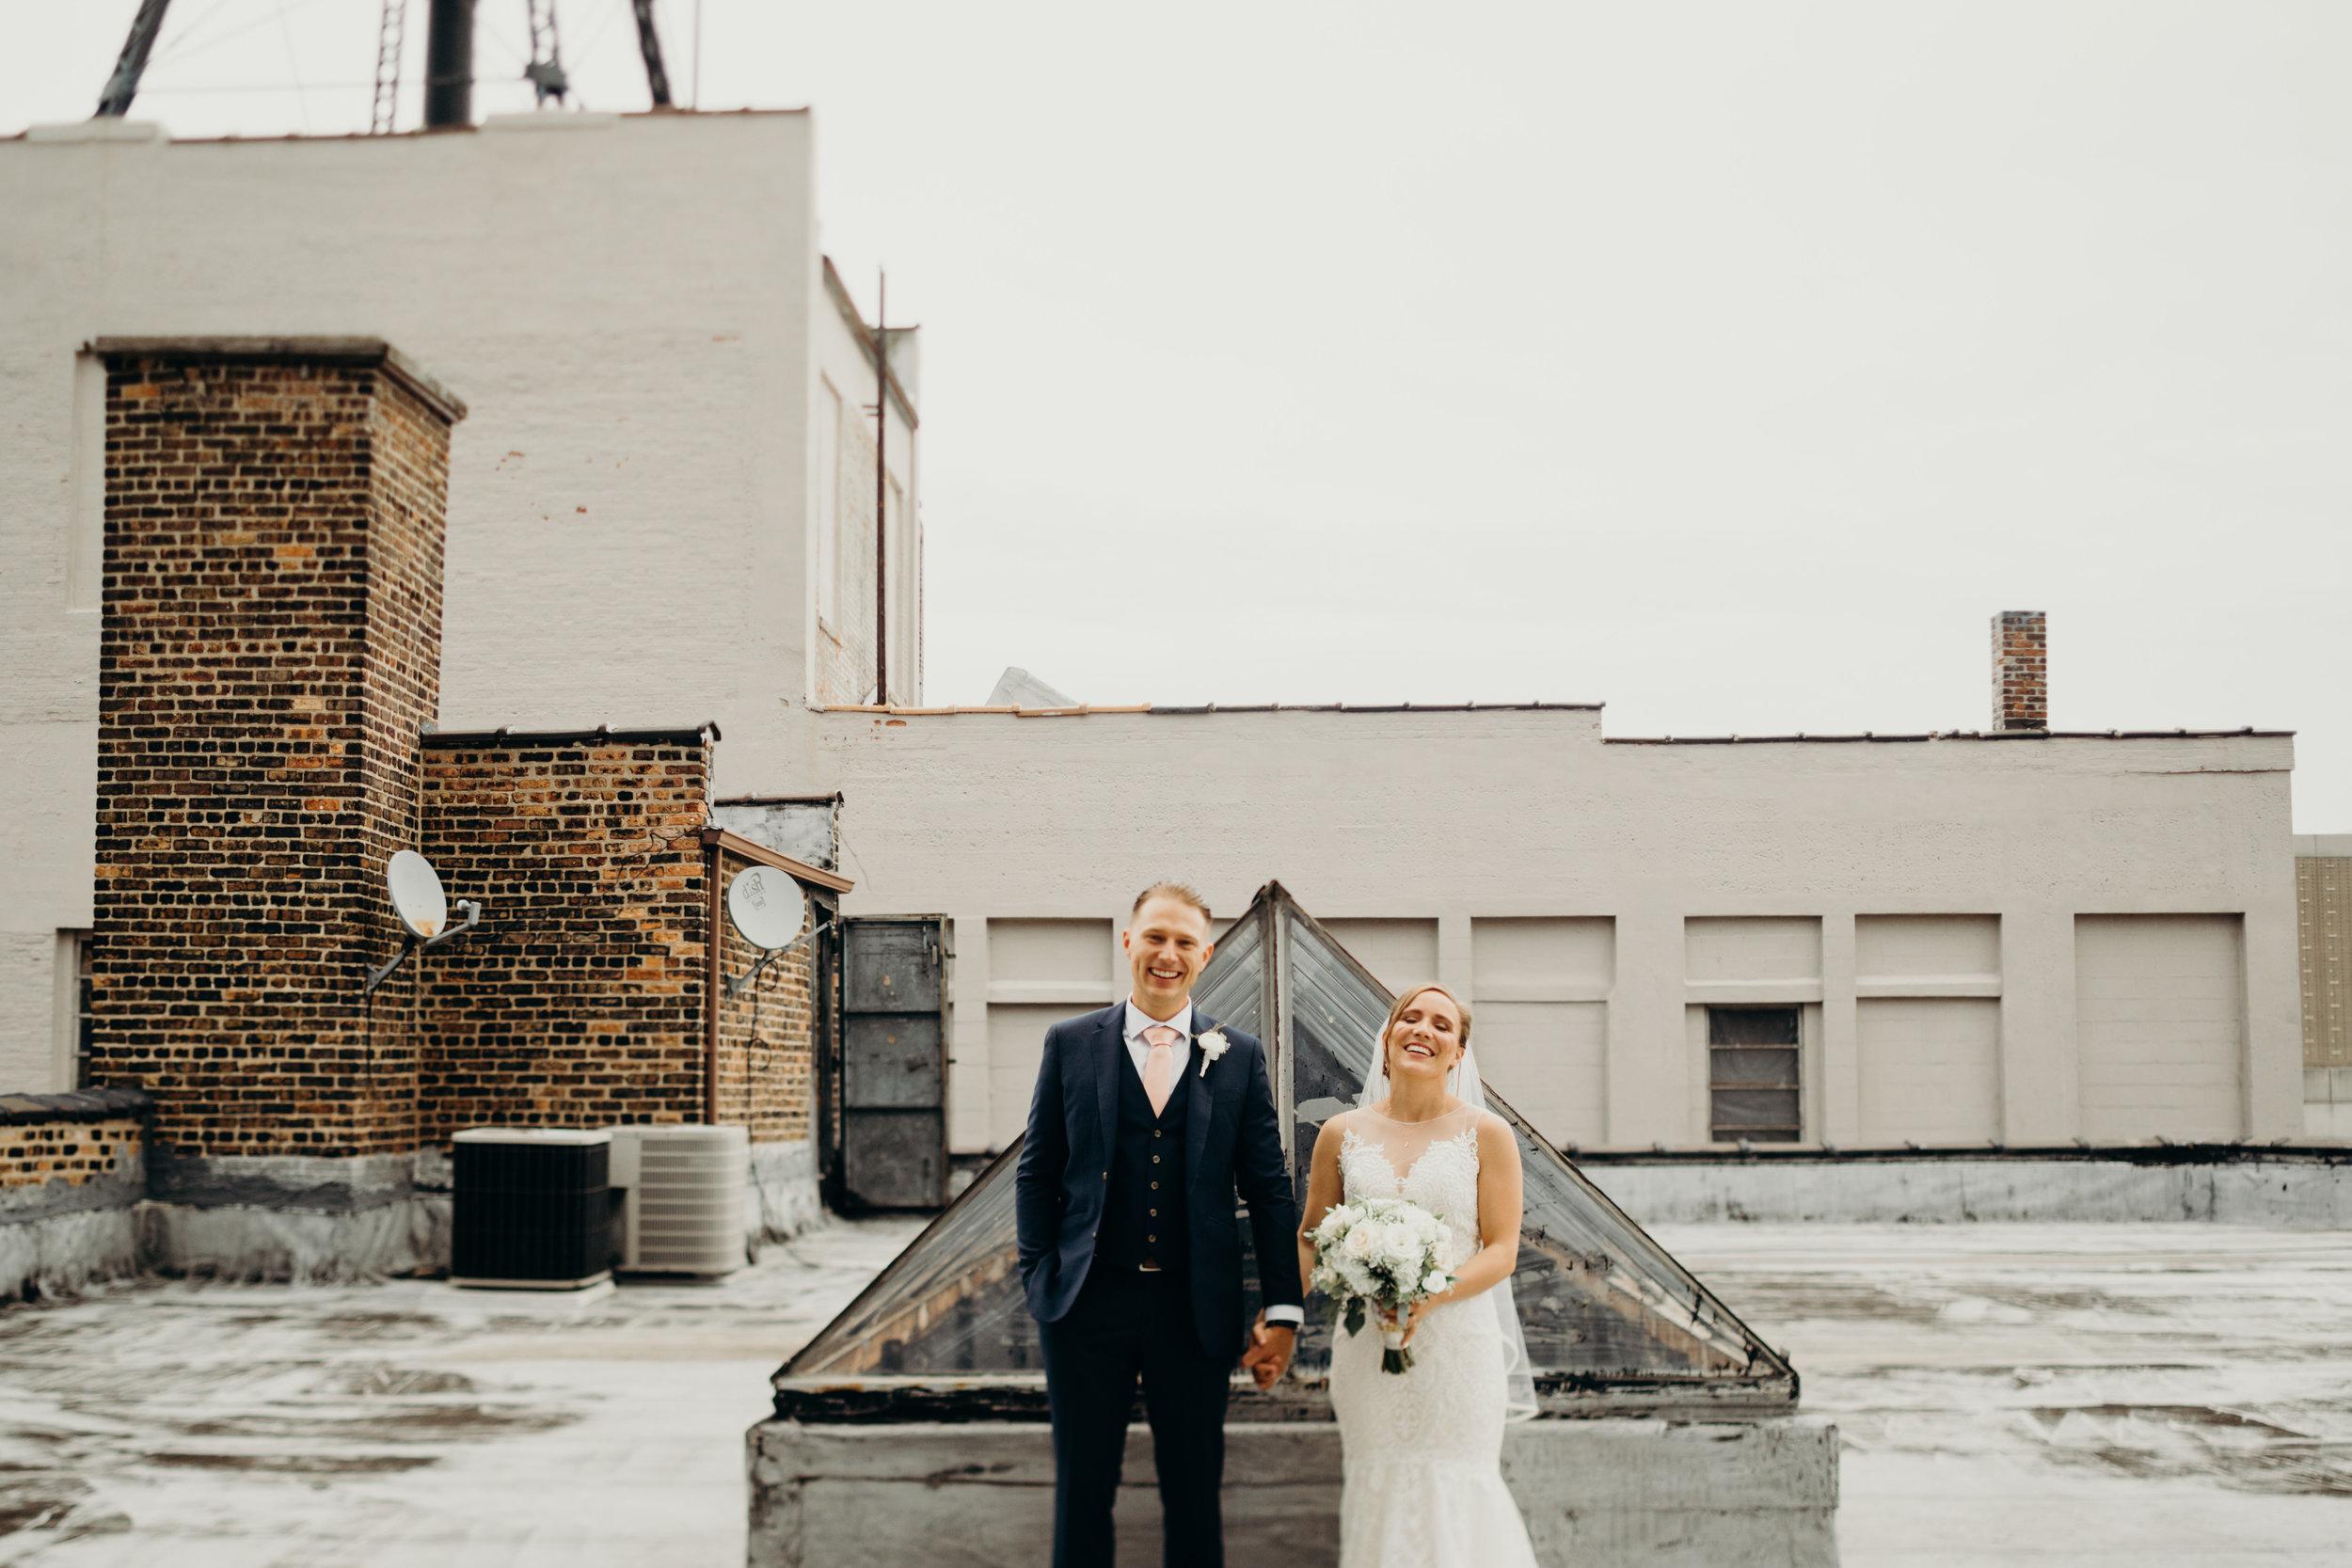 Vintage Wedding_Polly C Photography_20171726184013.jpg